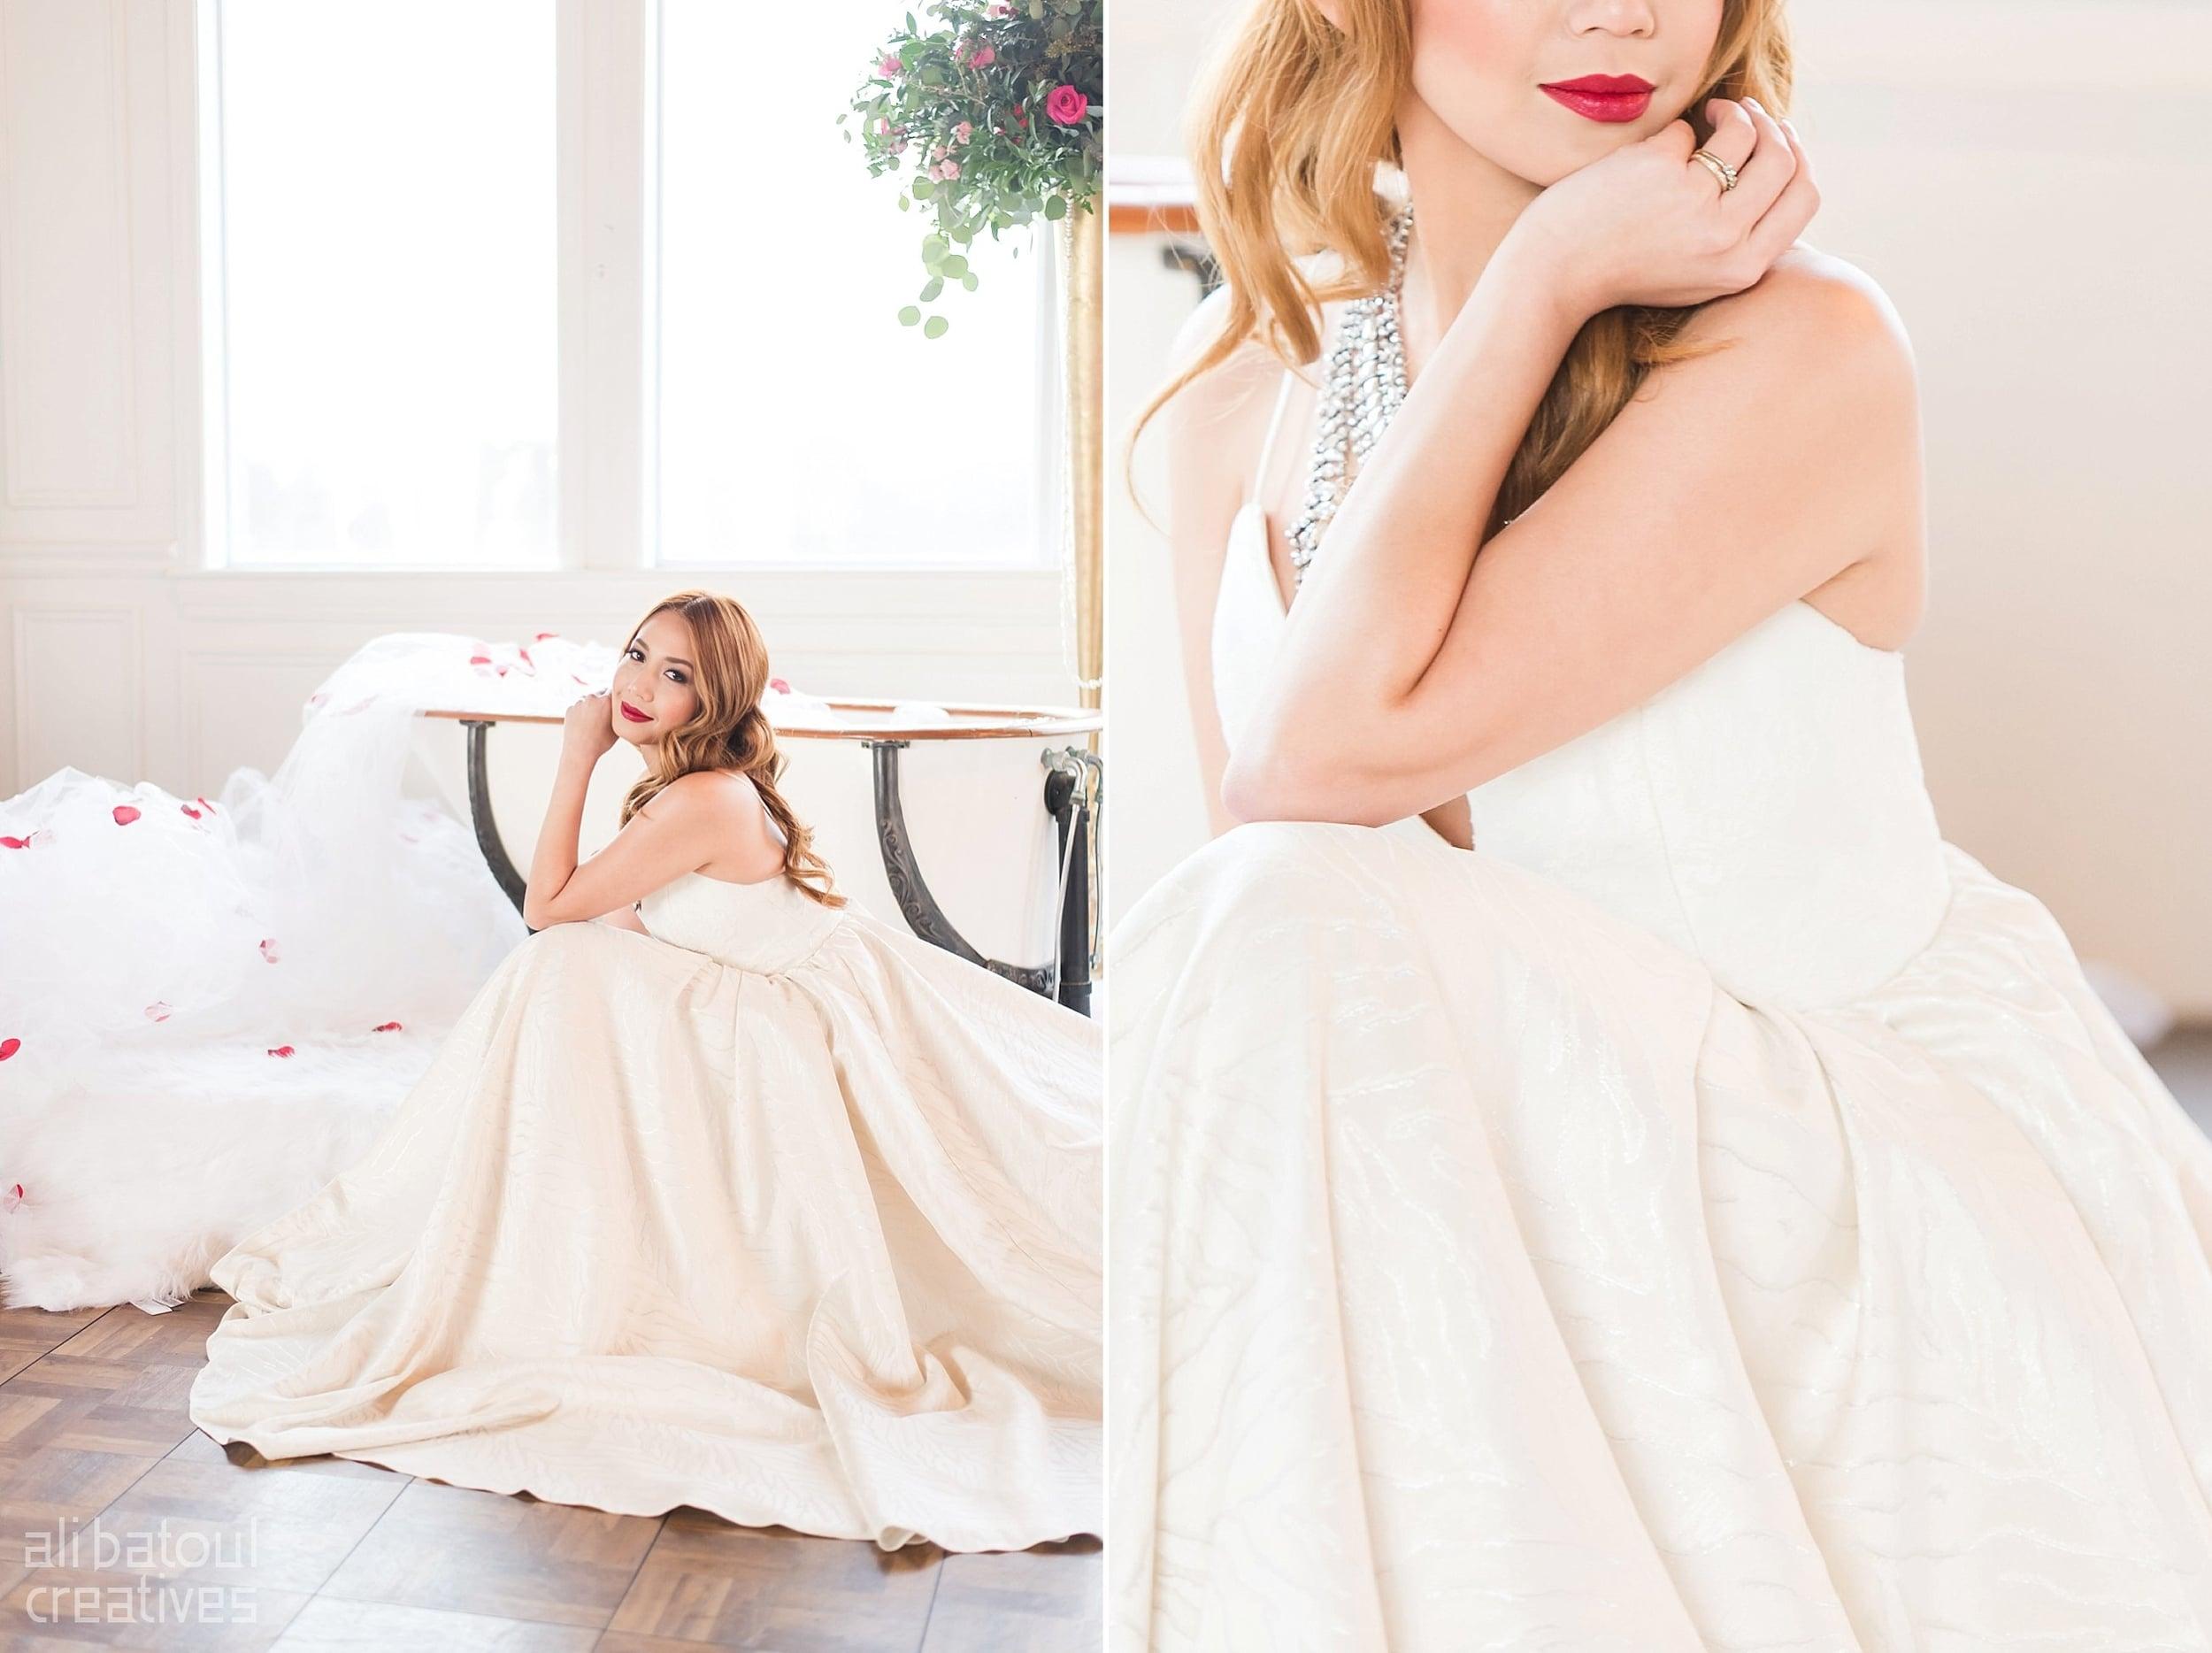 Glam Styled Shoot (blog) - Ali Batoul Creatives_-35_Stomped.jpg